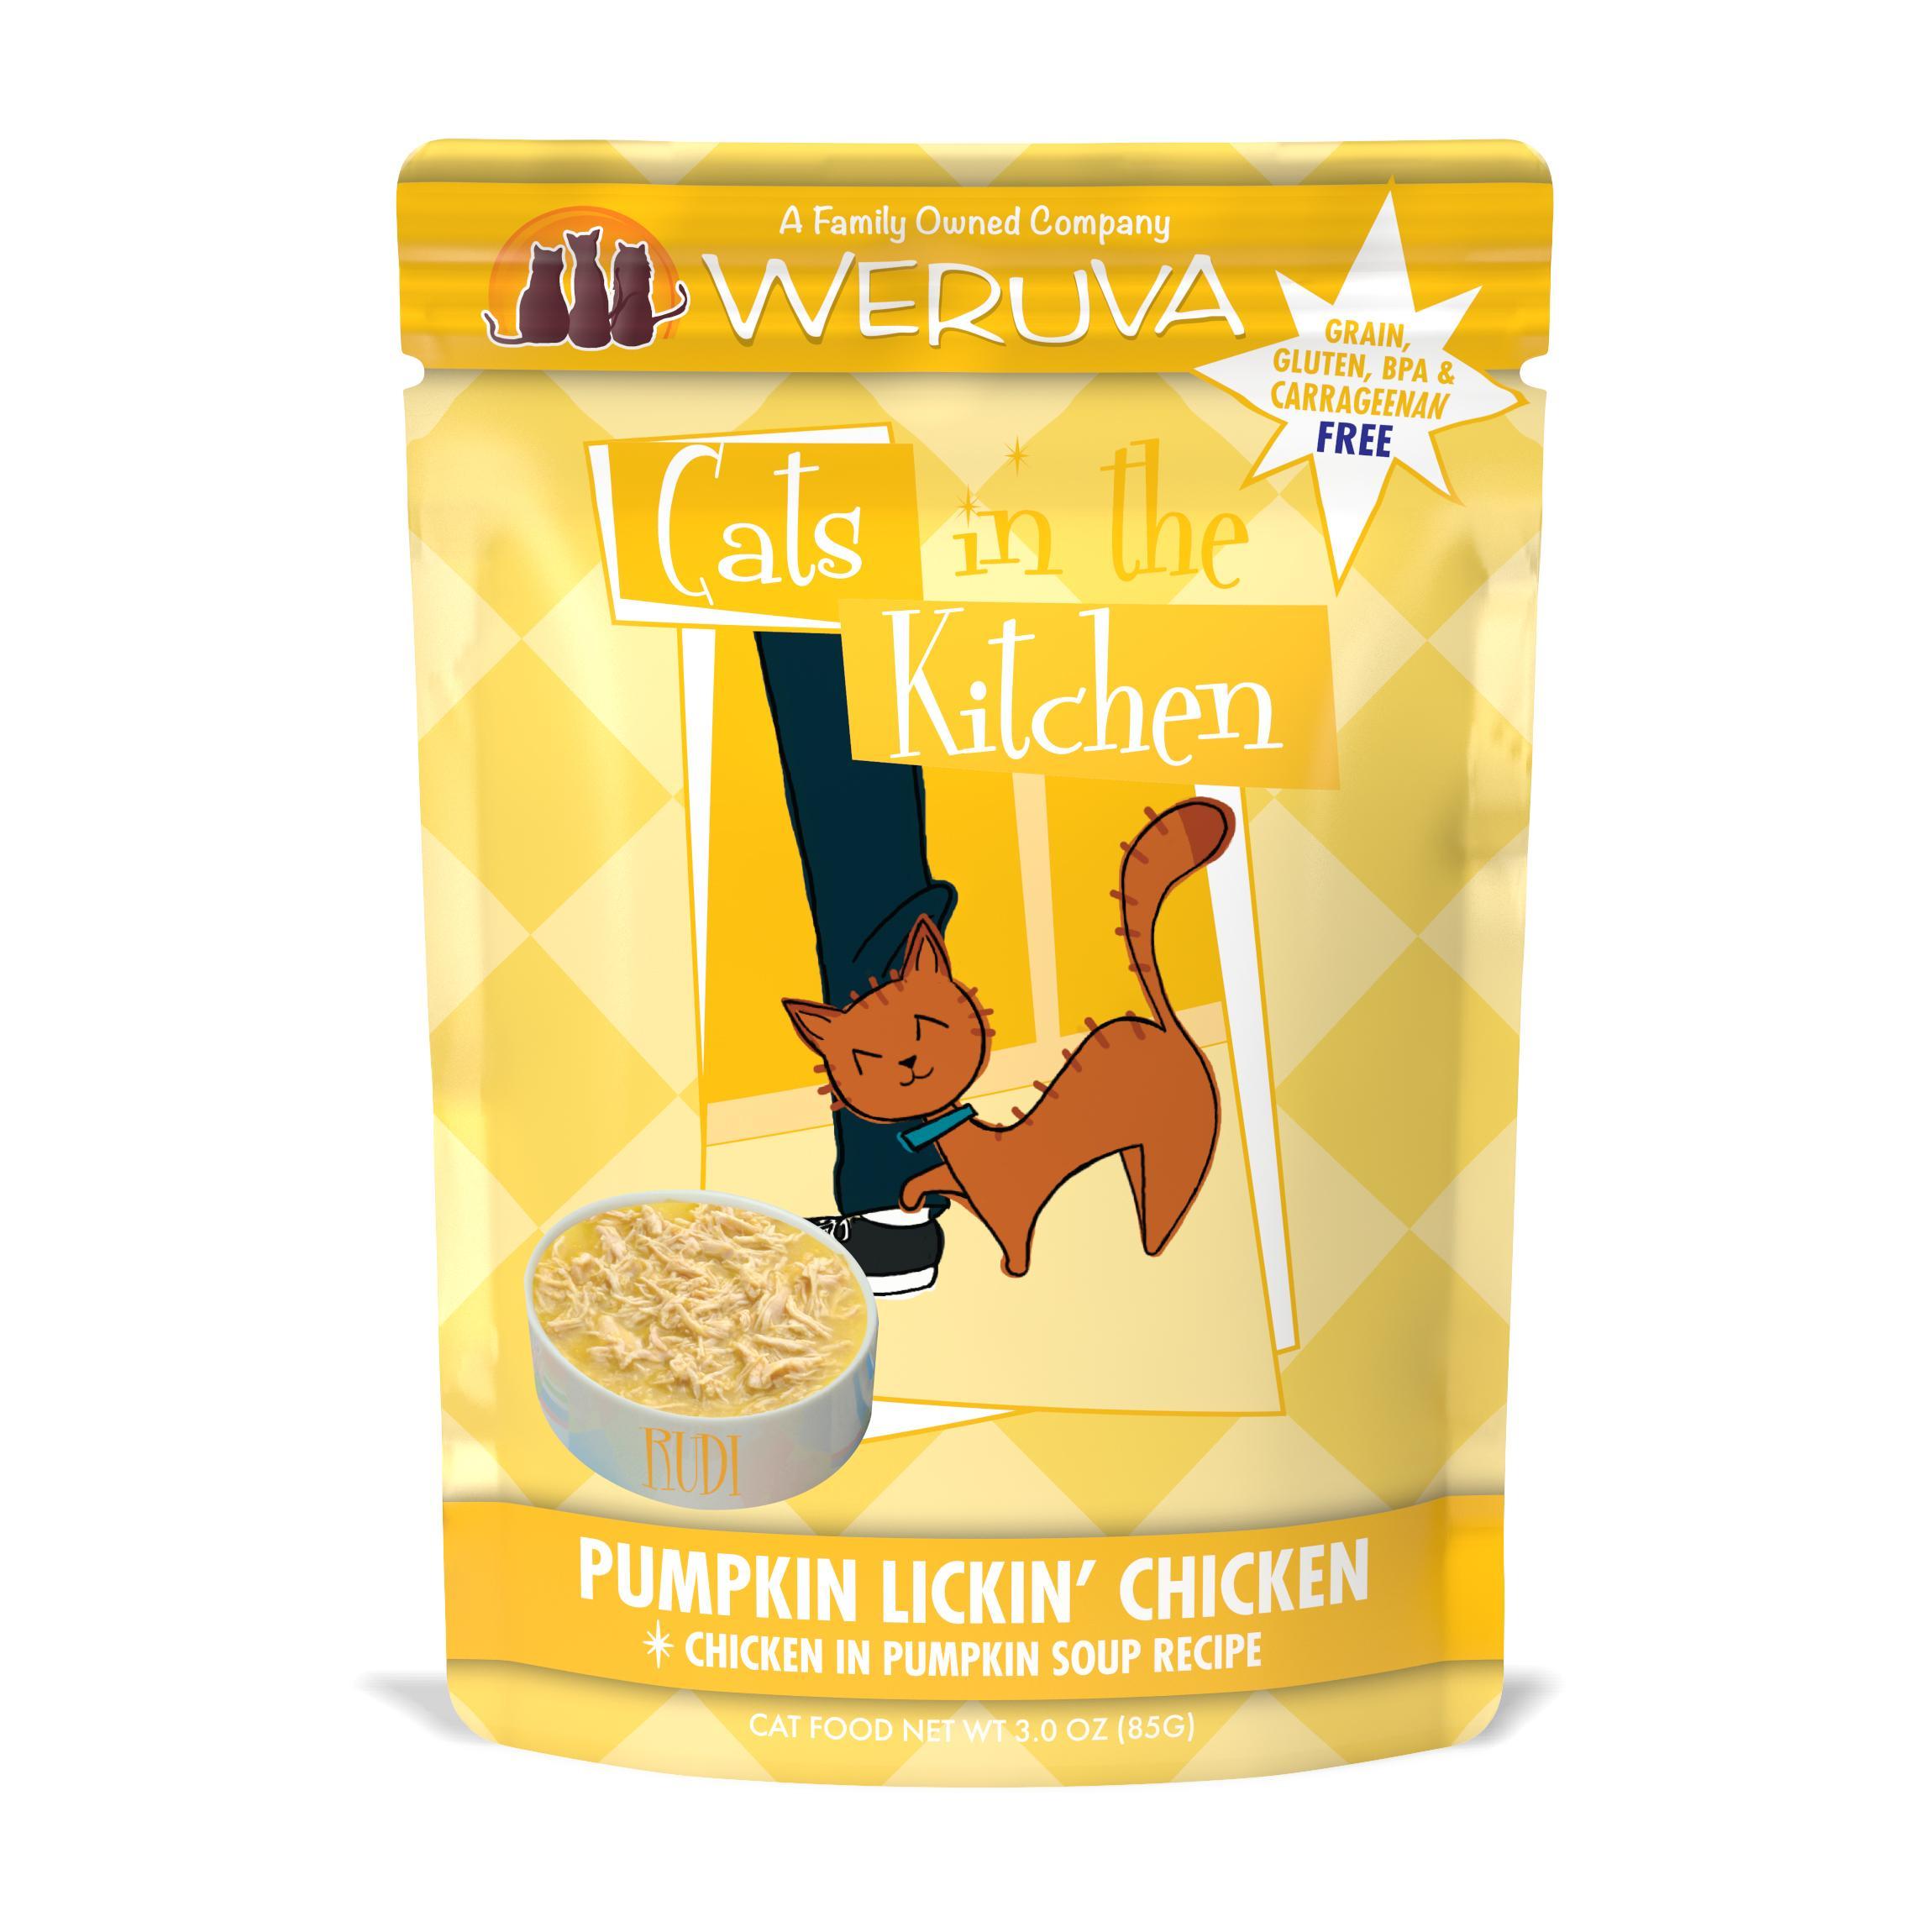 Weruva Cats in the Kitchen Pumpkin Lickin' Chicken in Pumpkin Soup Recipe Grain-Free Wet Cat Food Image